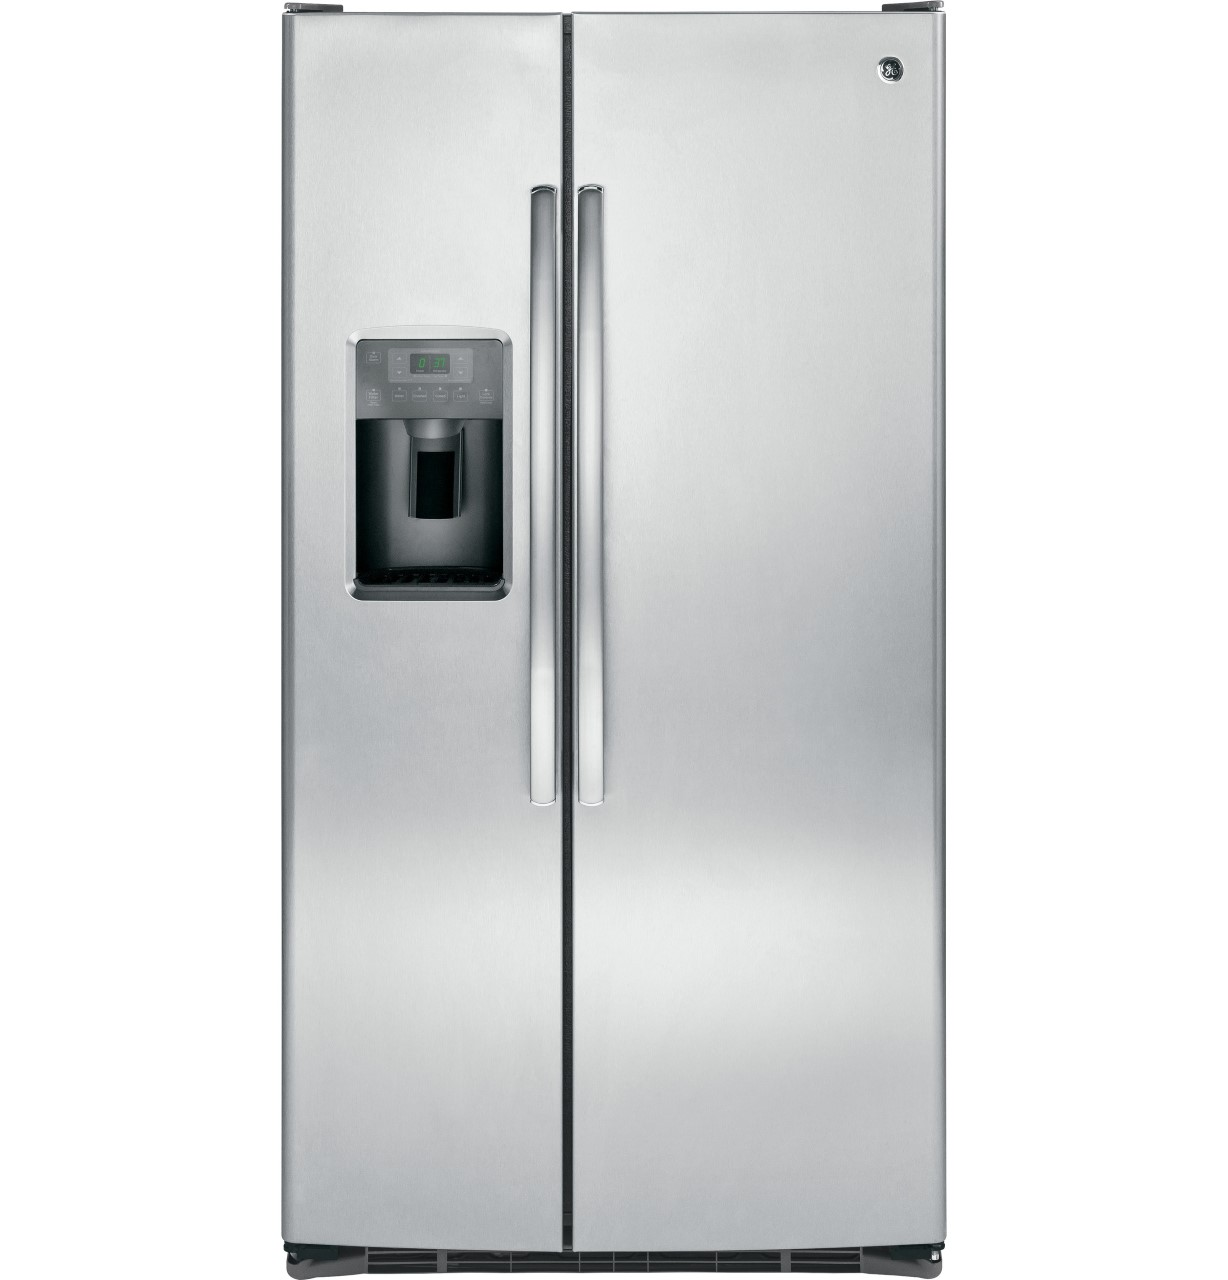 GSS25GSHSS GE SXS Refrigerator